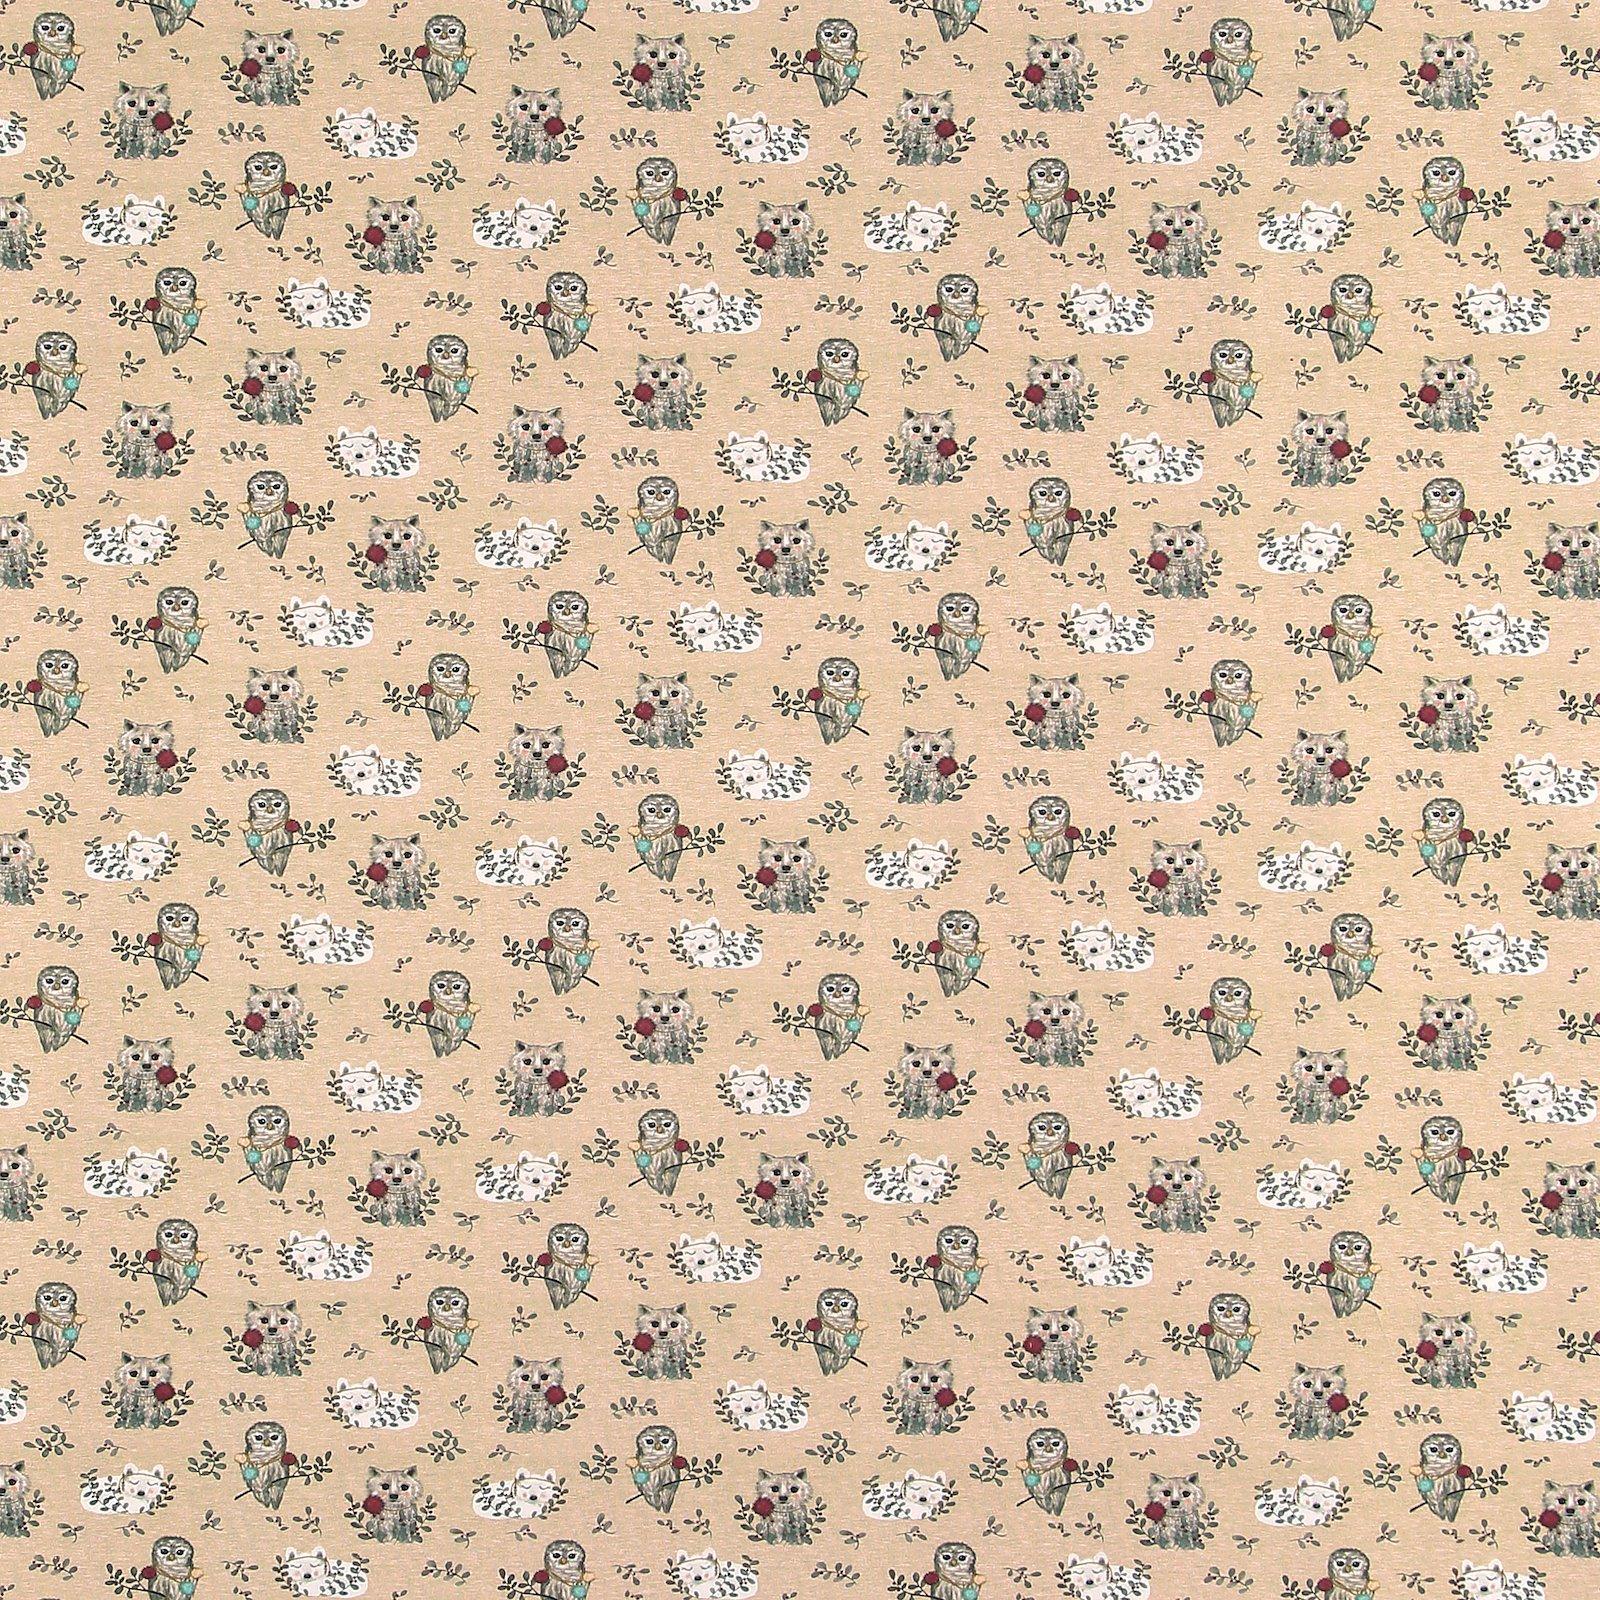 Organic st jersey sand melange w animals 272797_pack_sp